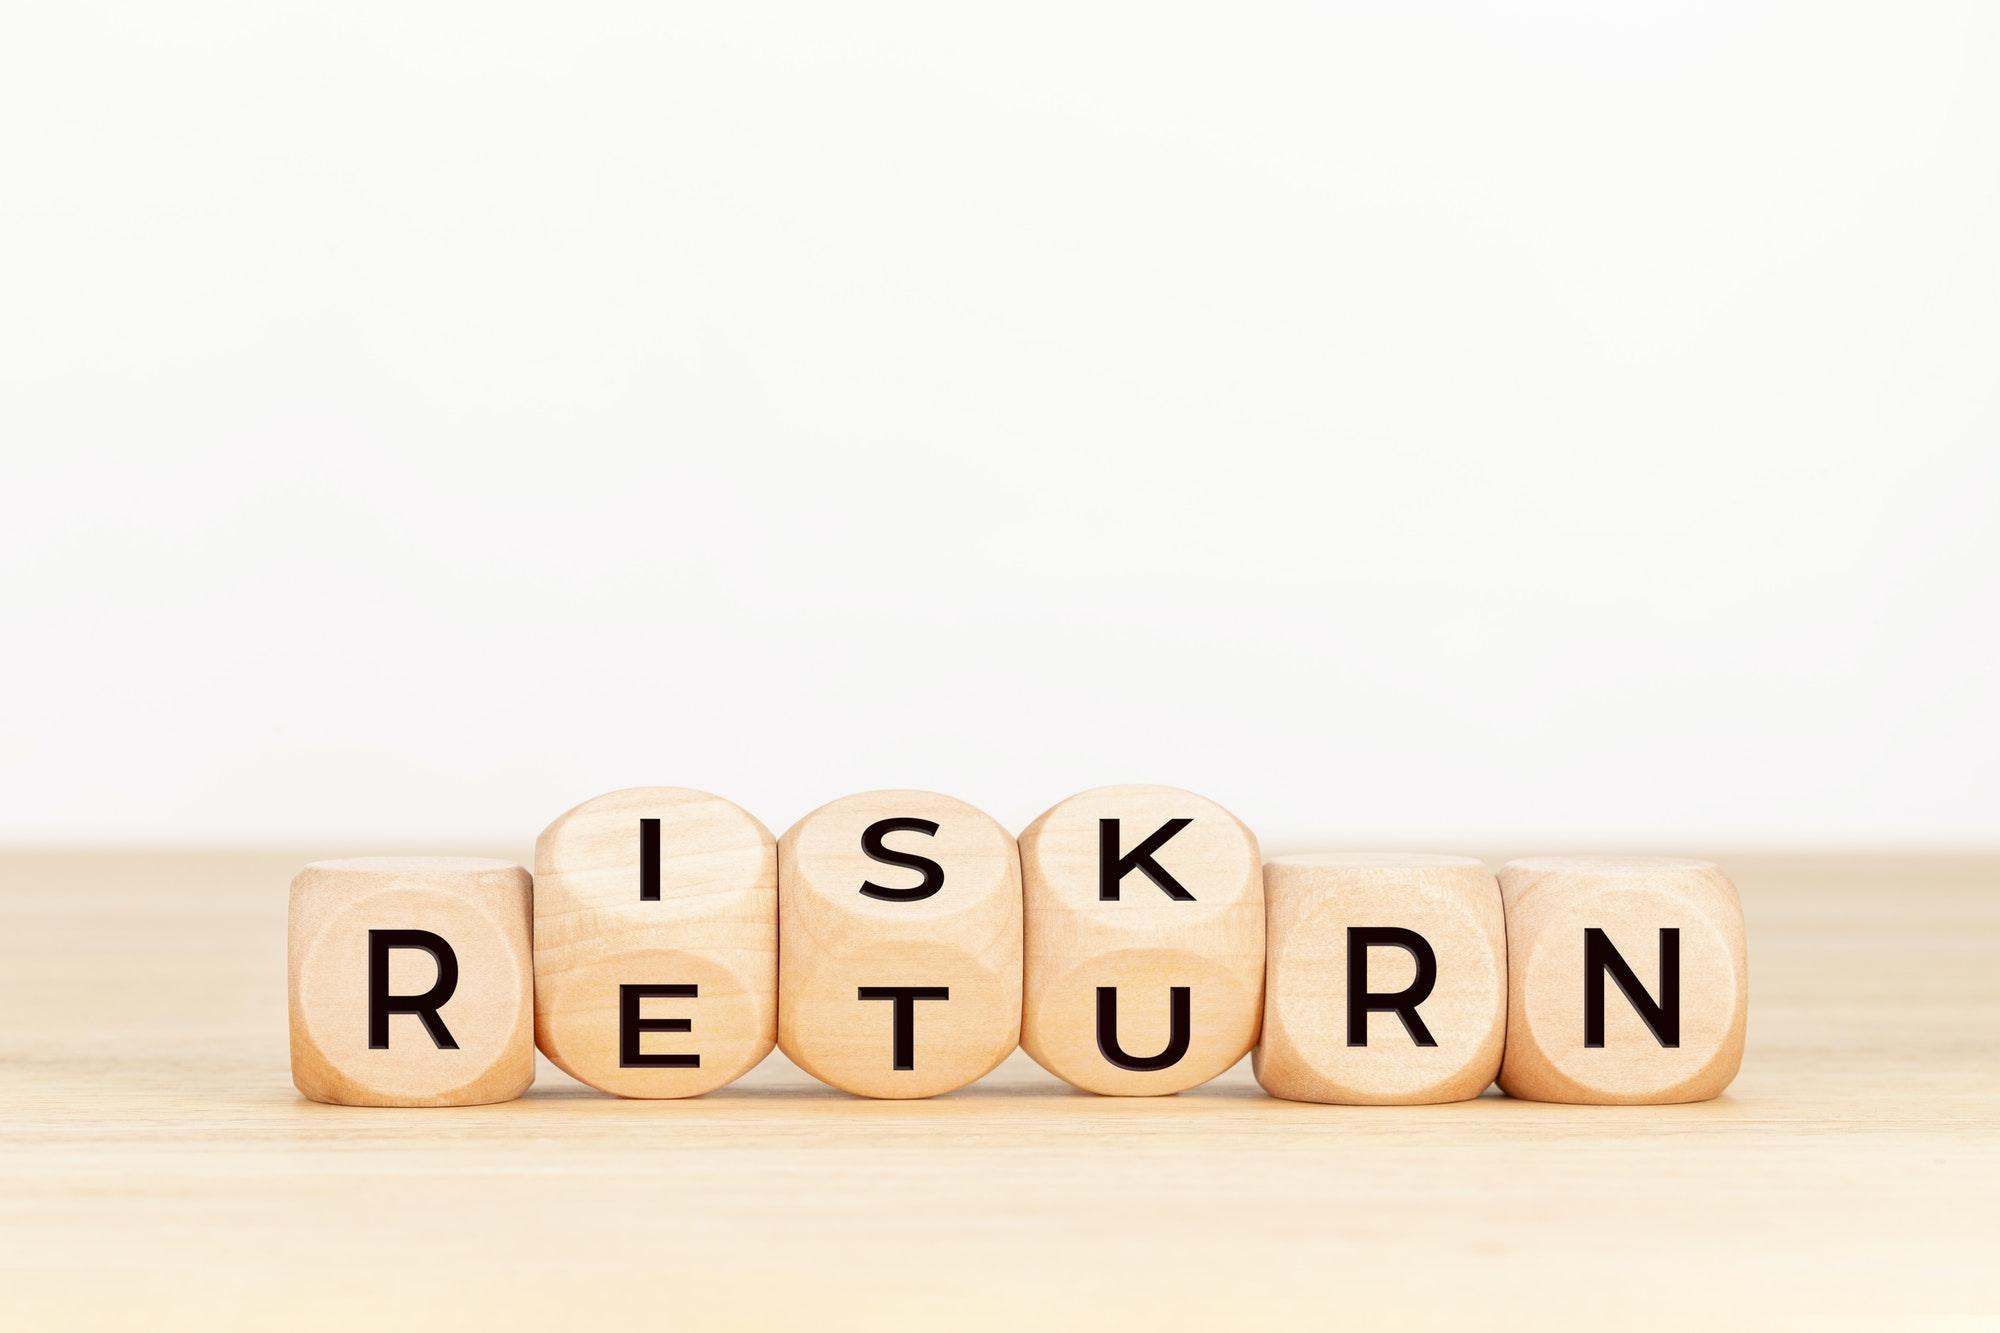 Risk Return concept